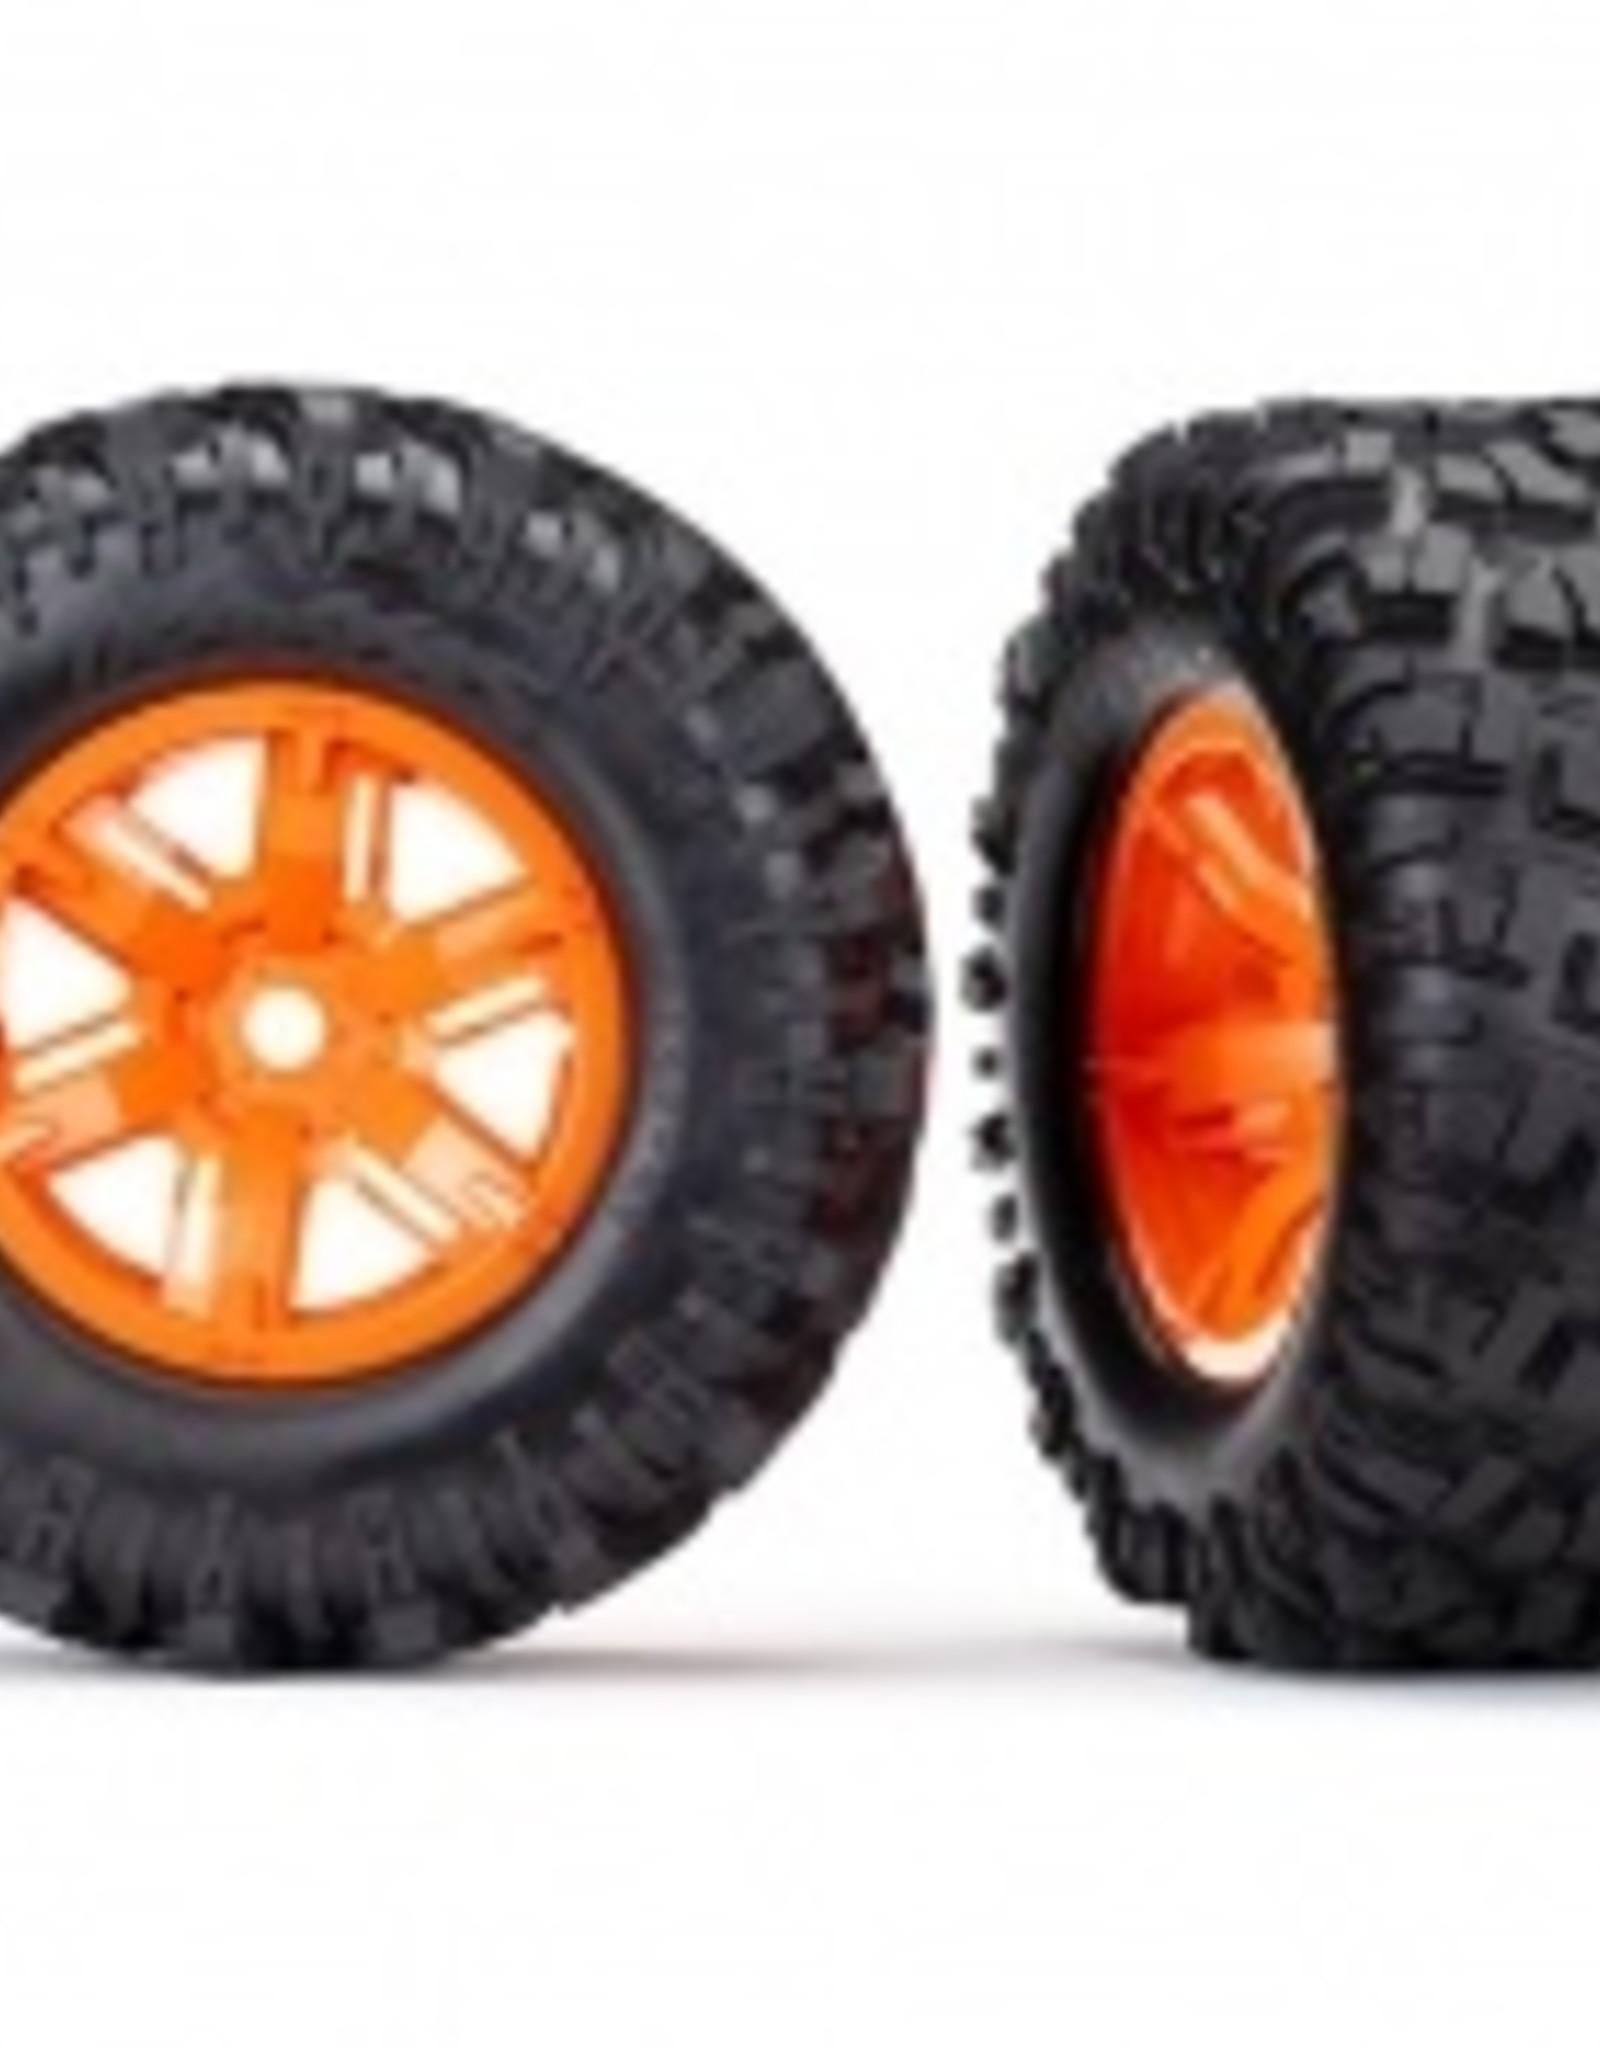 Traxxas Traxxas X-Maxx Tires & wheels, assembled, glued (X-Maxx® orange wheels, Maxx® AT tires, foam inserts) (left & right) (2)